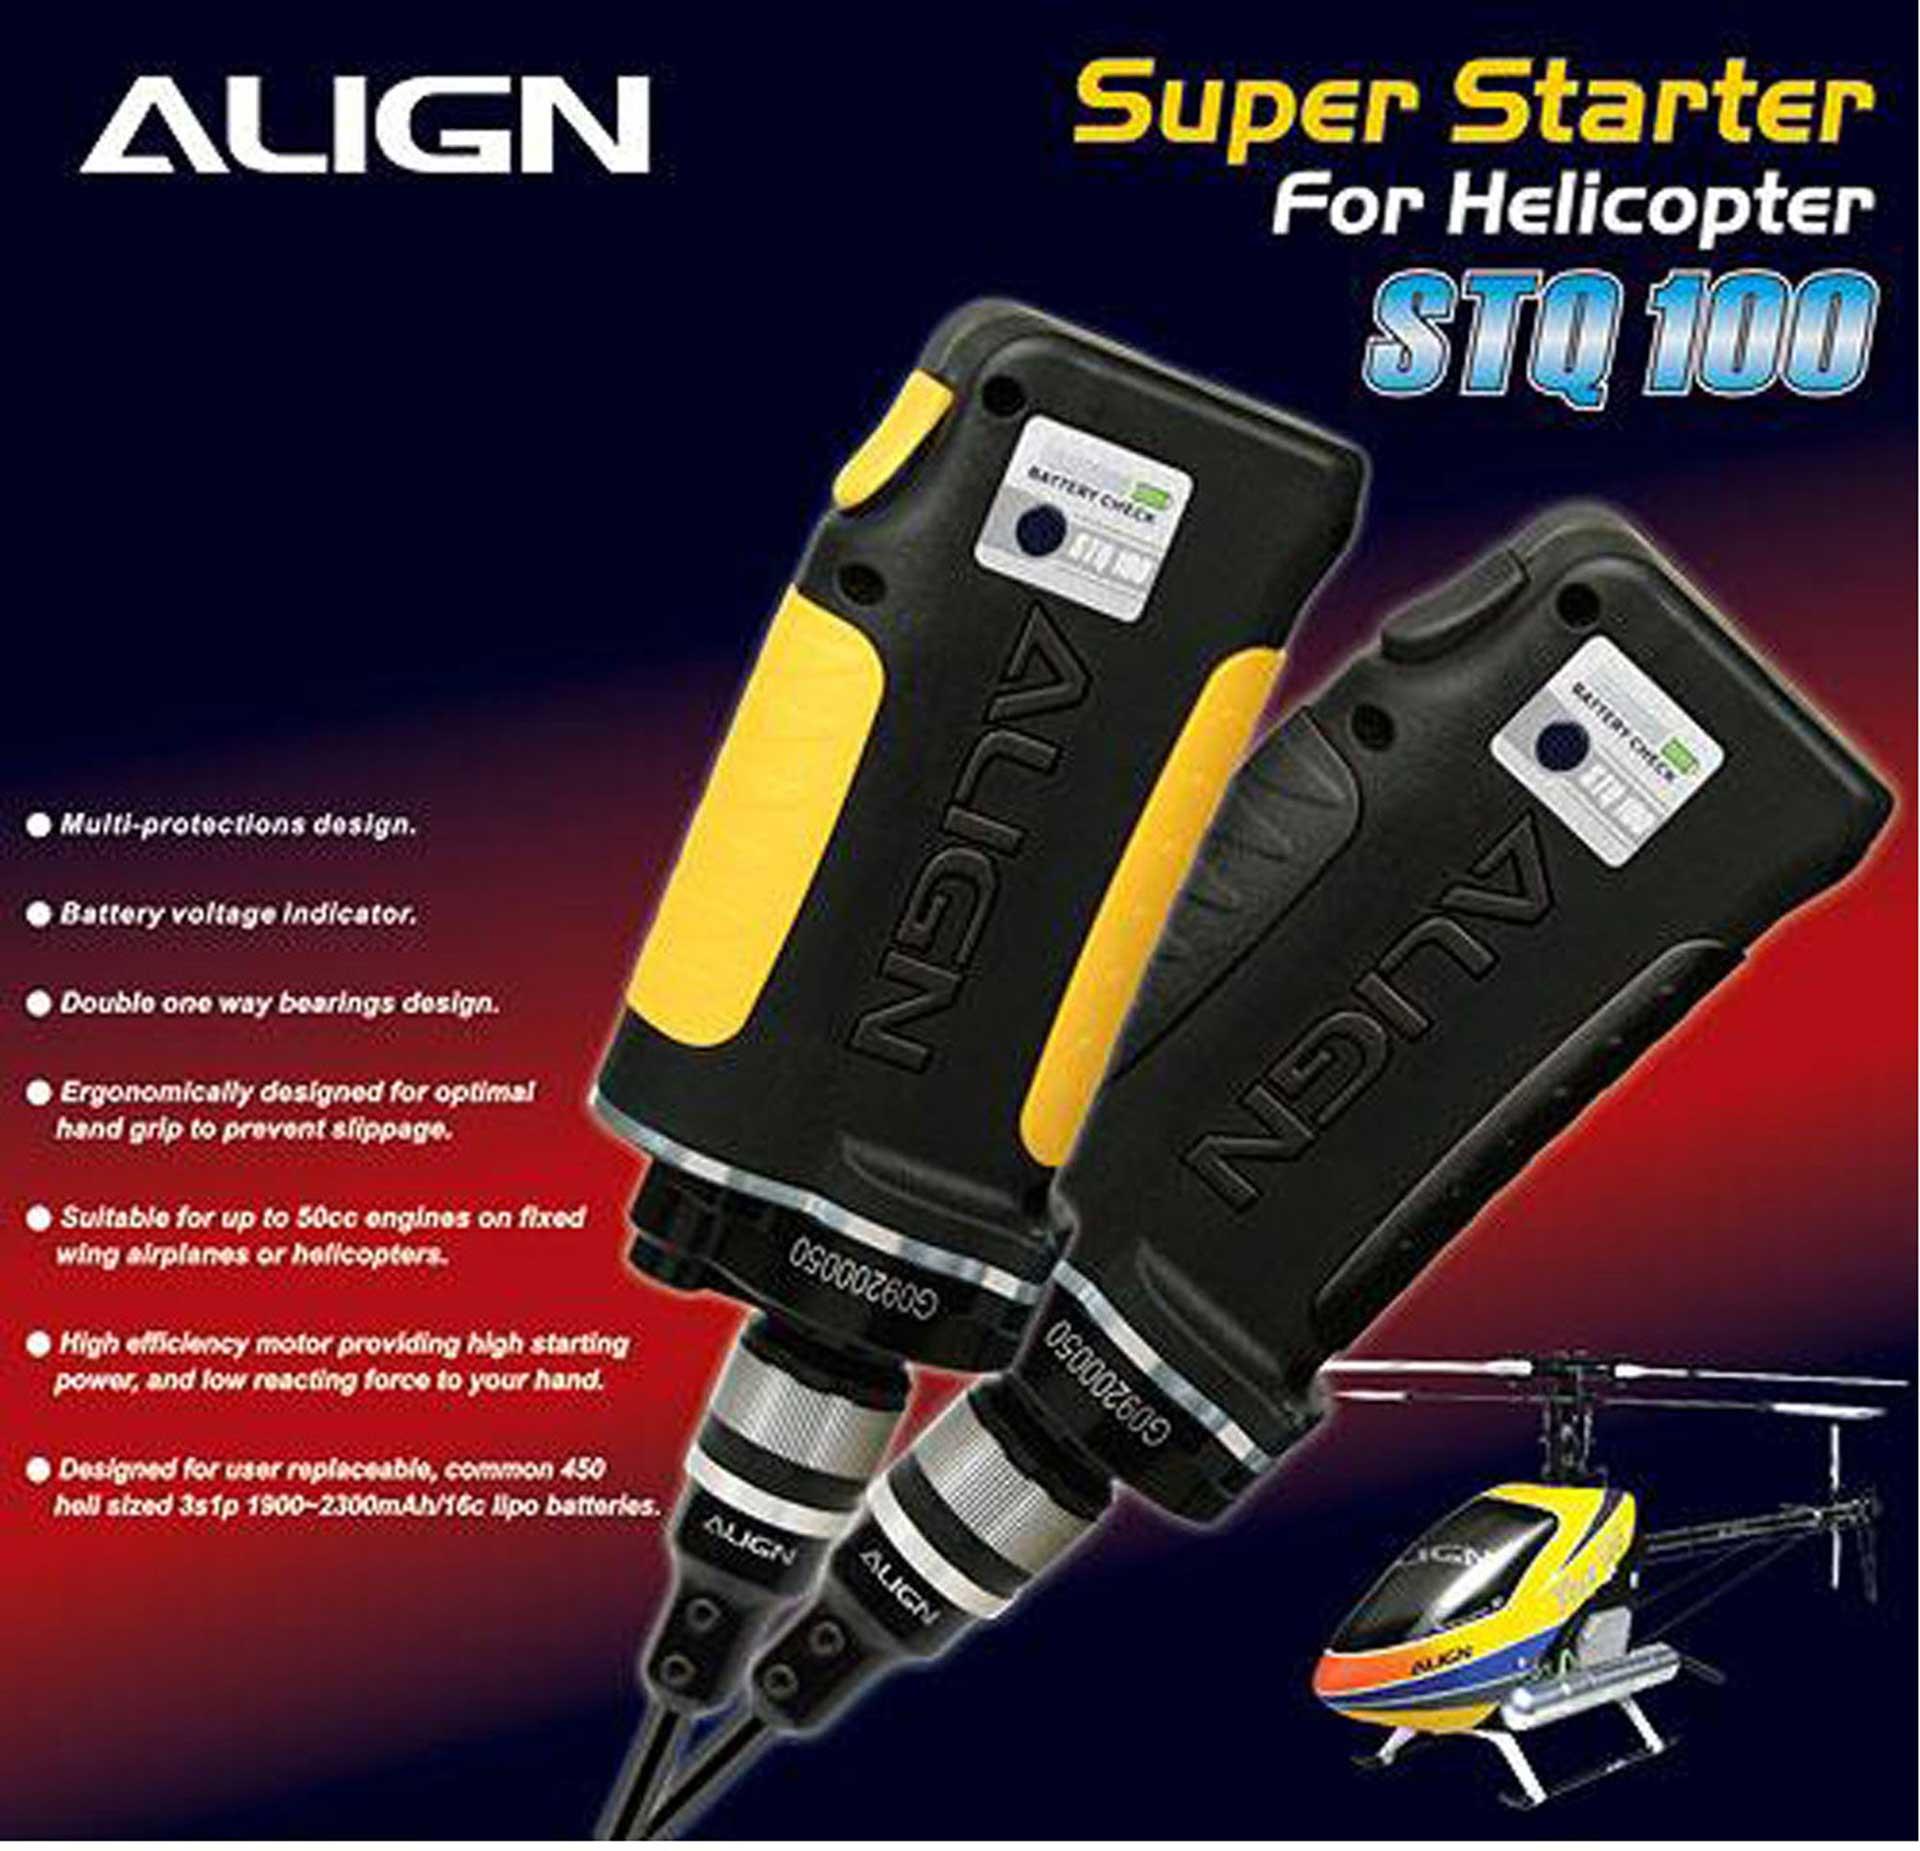 ALIGN Super Starter (Helicopter) schwarz